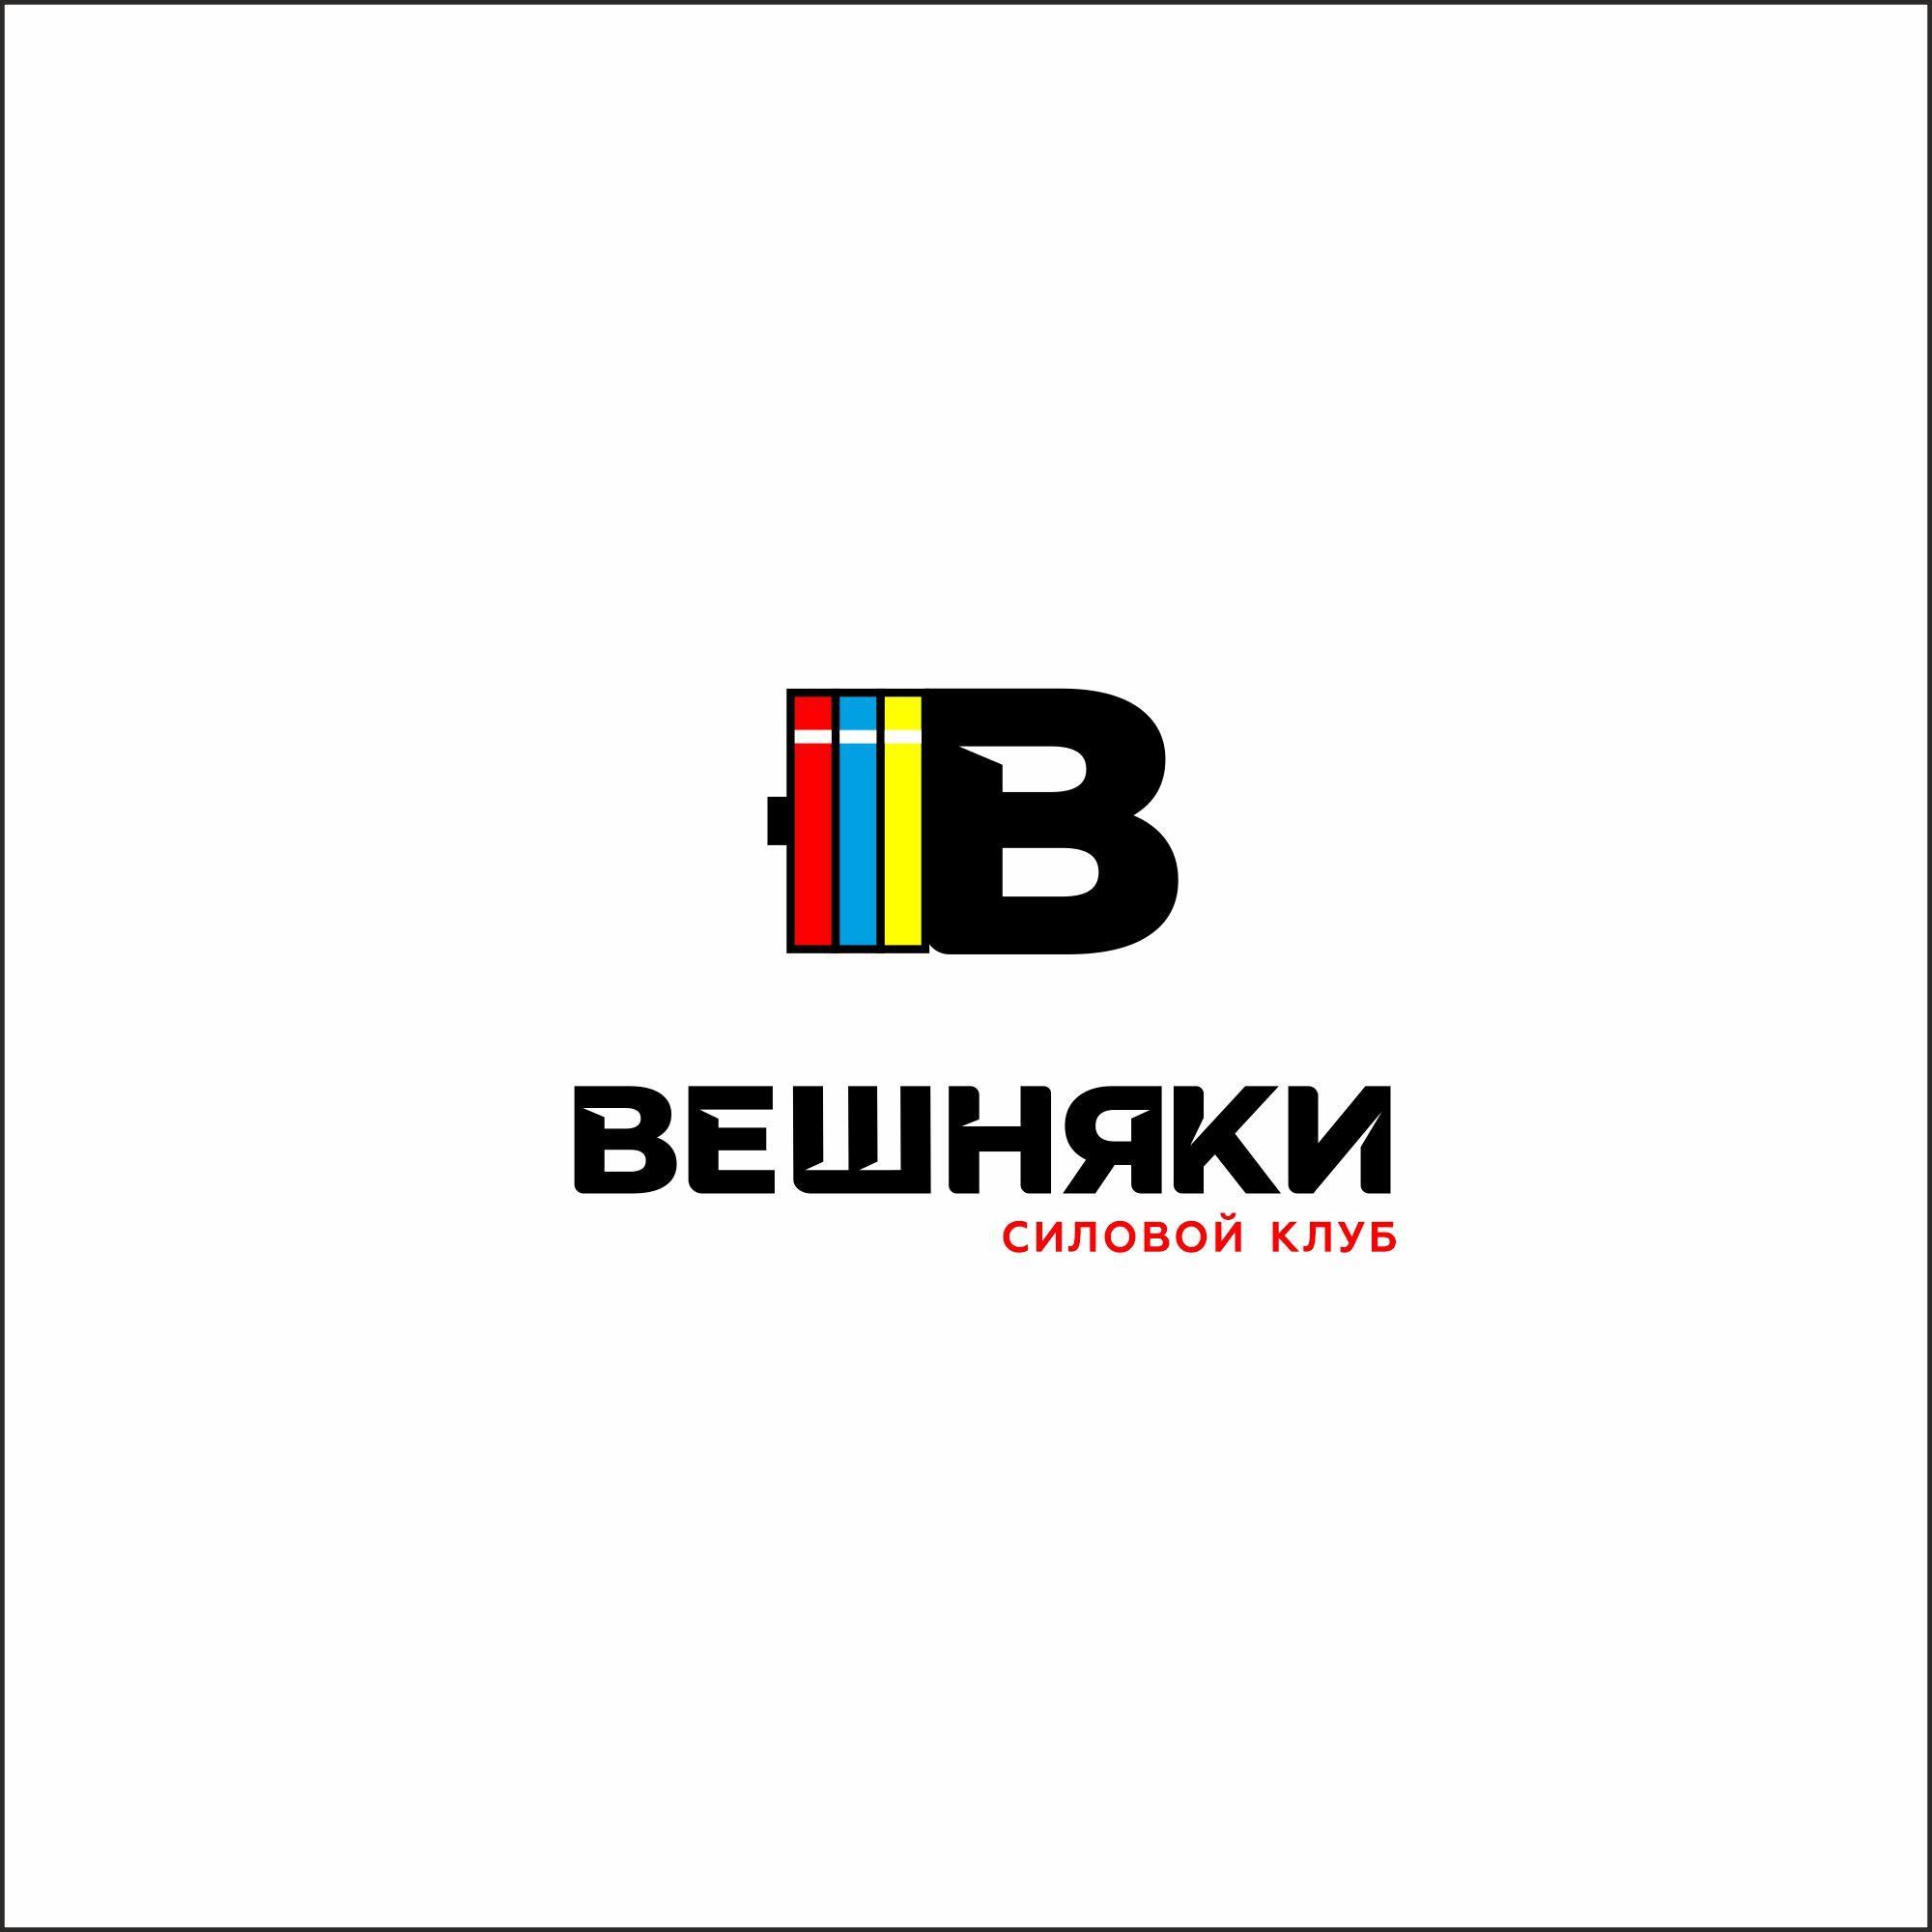 Адаптация (разработка) логотипа Силового клуба ВЕШНЯКИ в инт фото f_3325fbb8aae97ab8.jpg